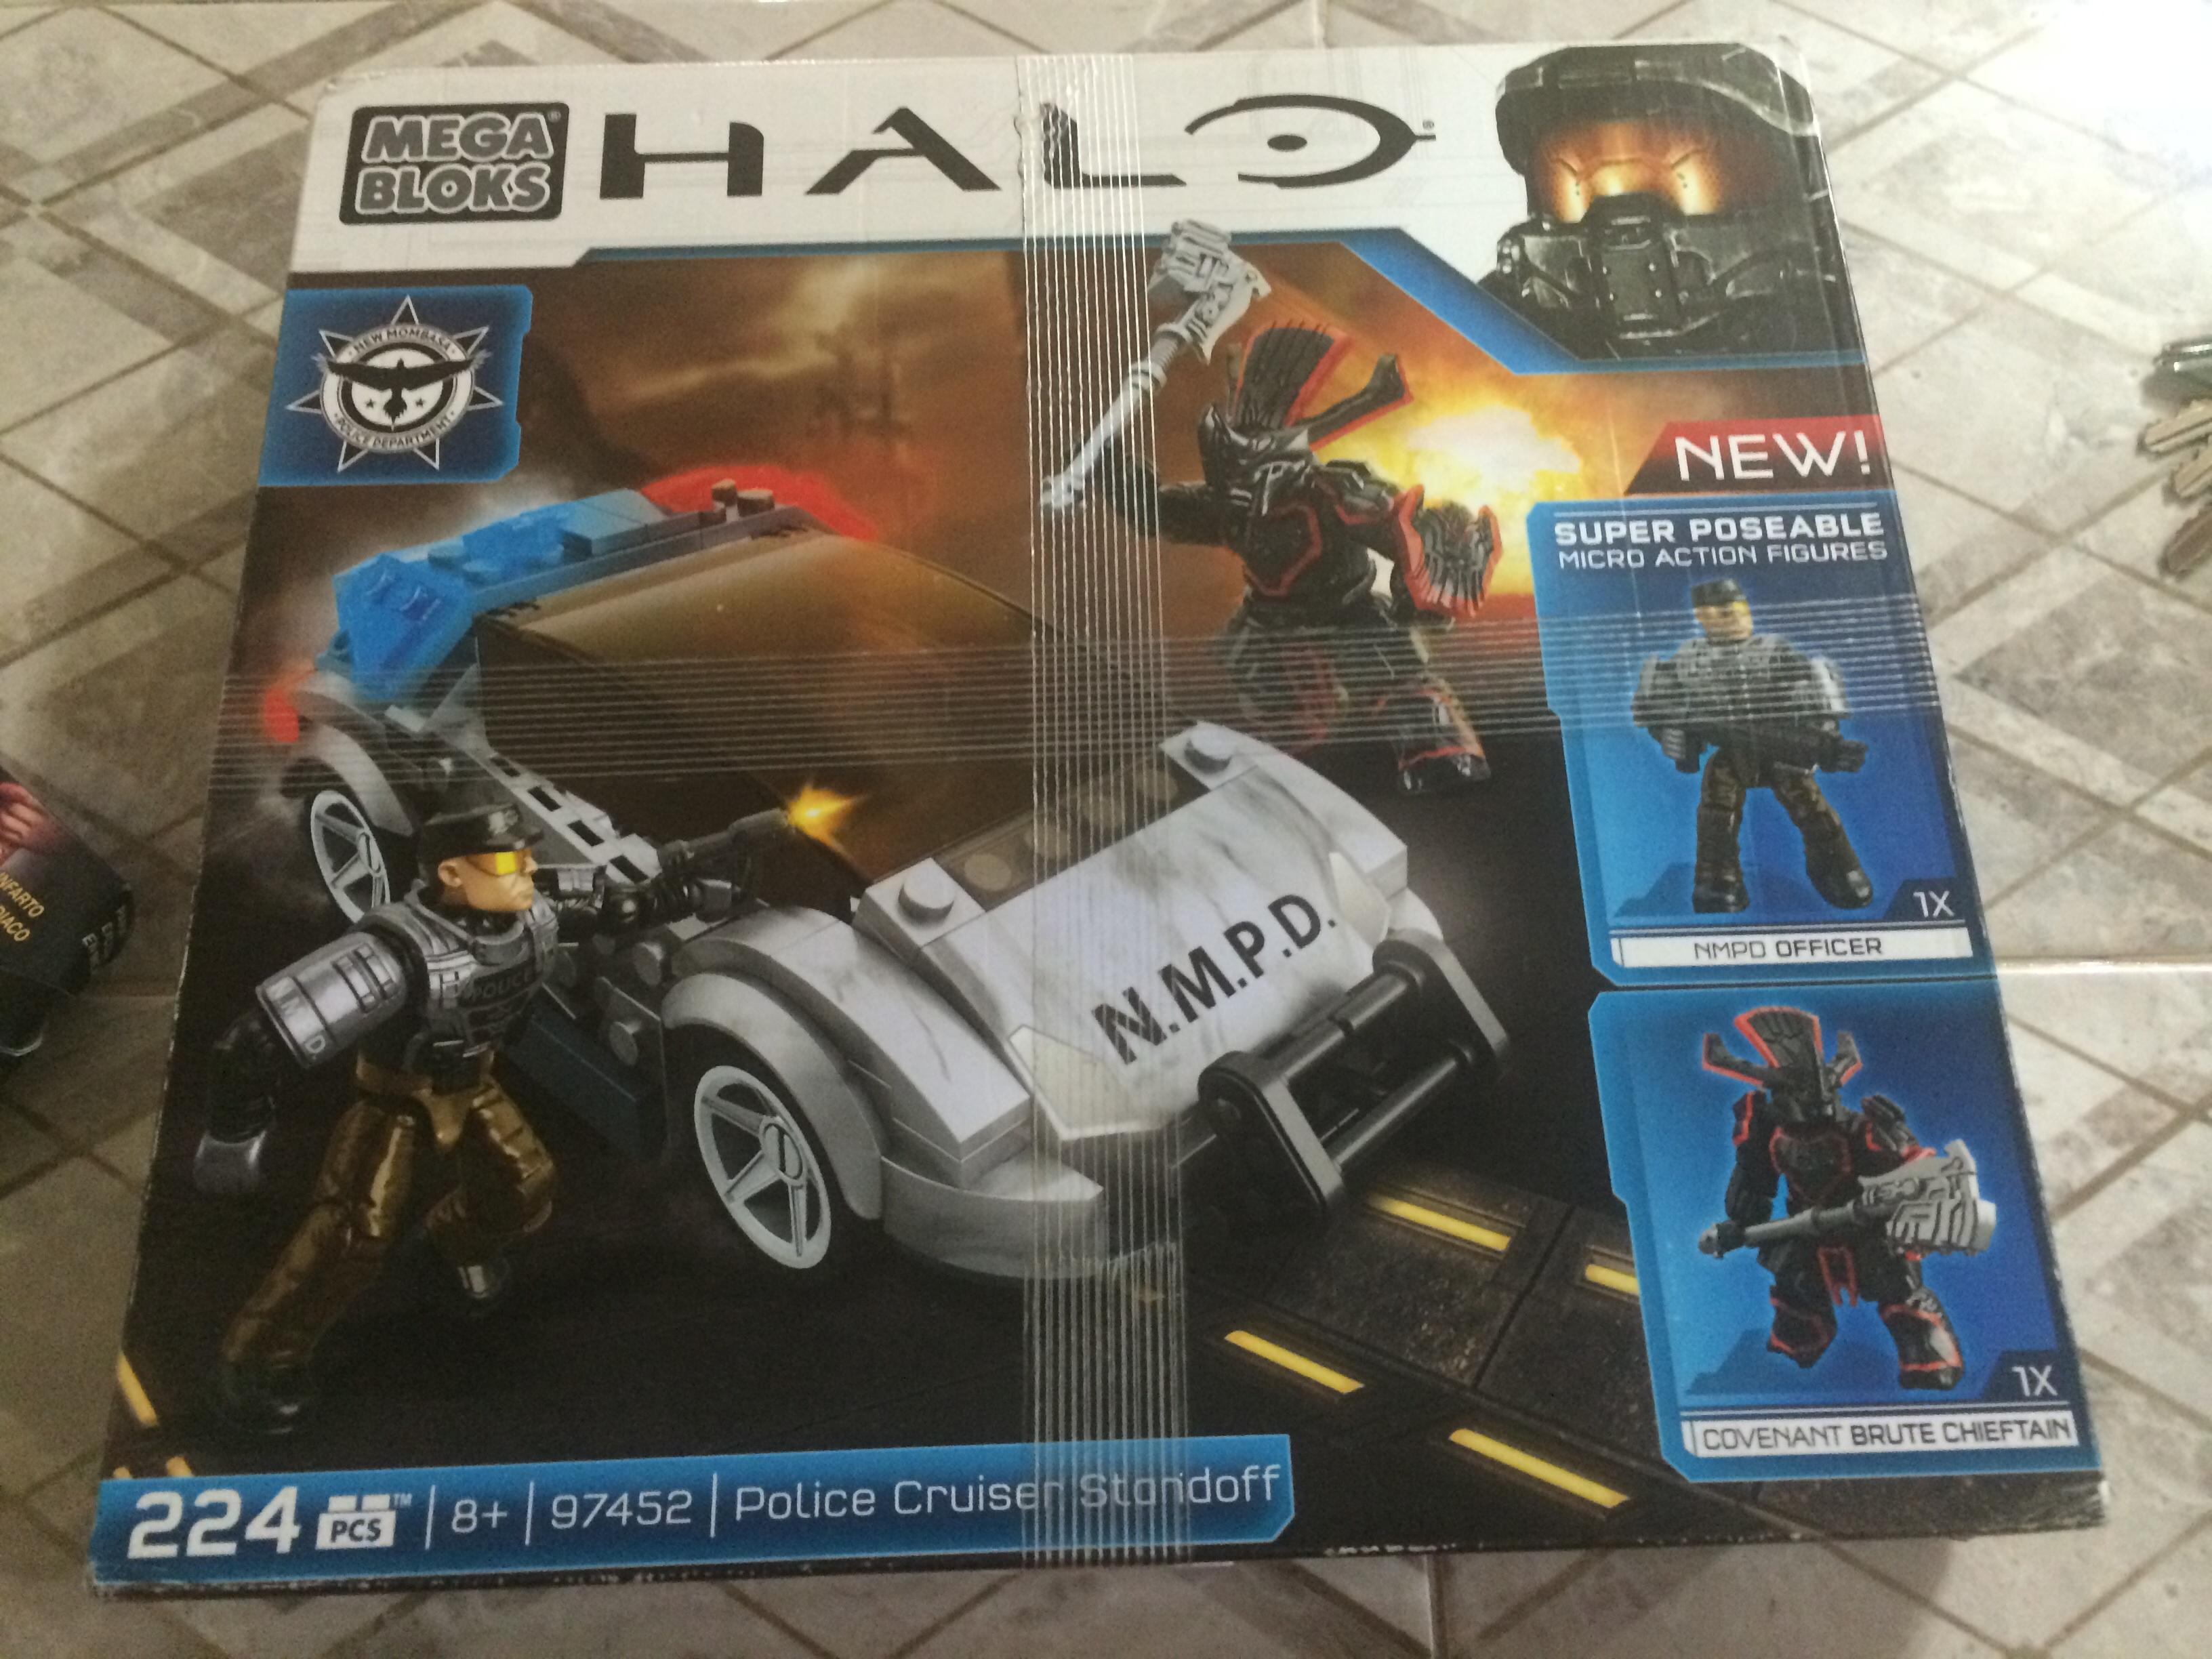 Bodega Aurrerá: Halo Mega bloks a $39.02